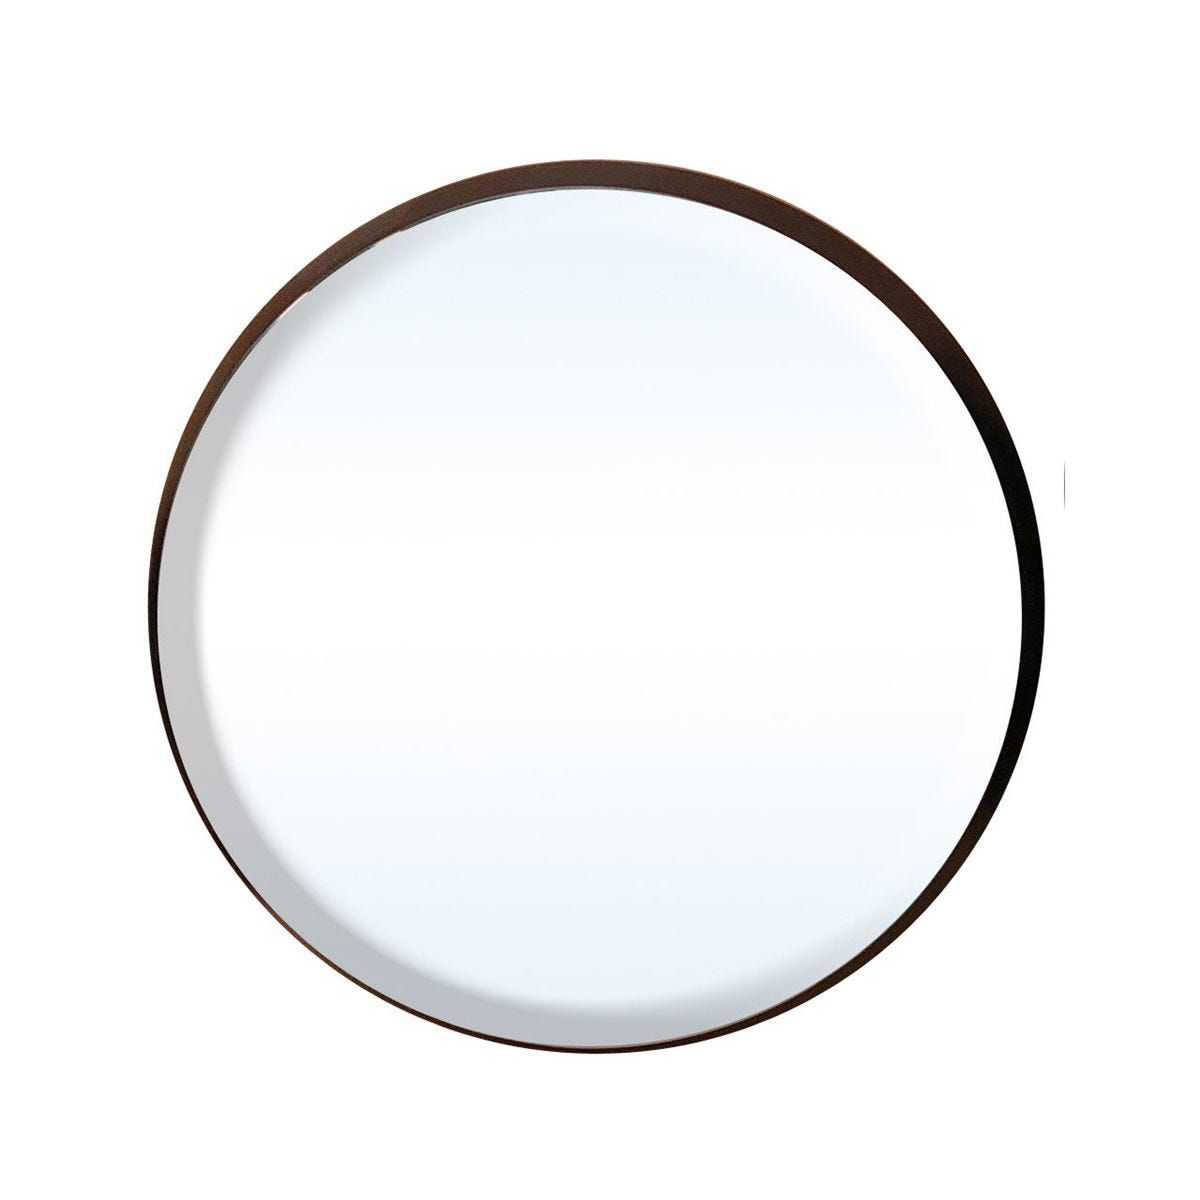 Discus Round Wall Mirror in Black - Medium